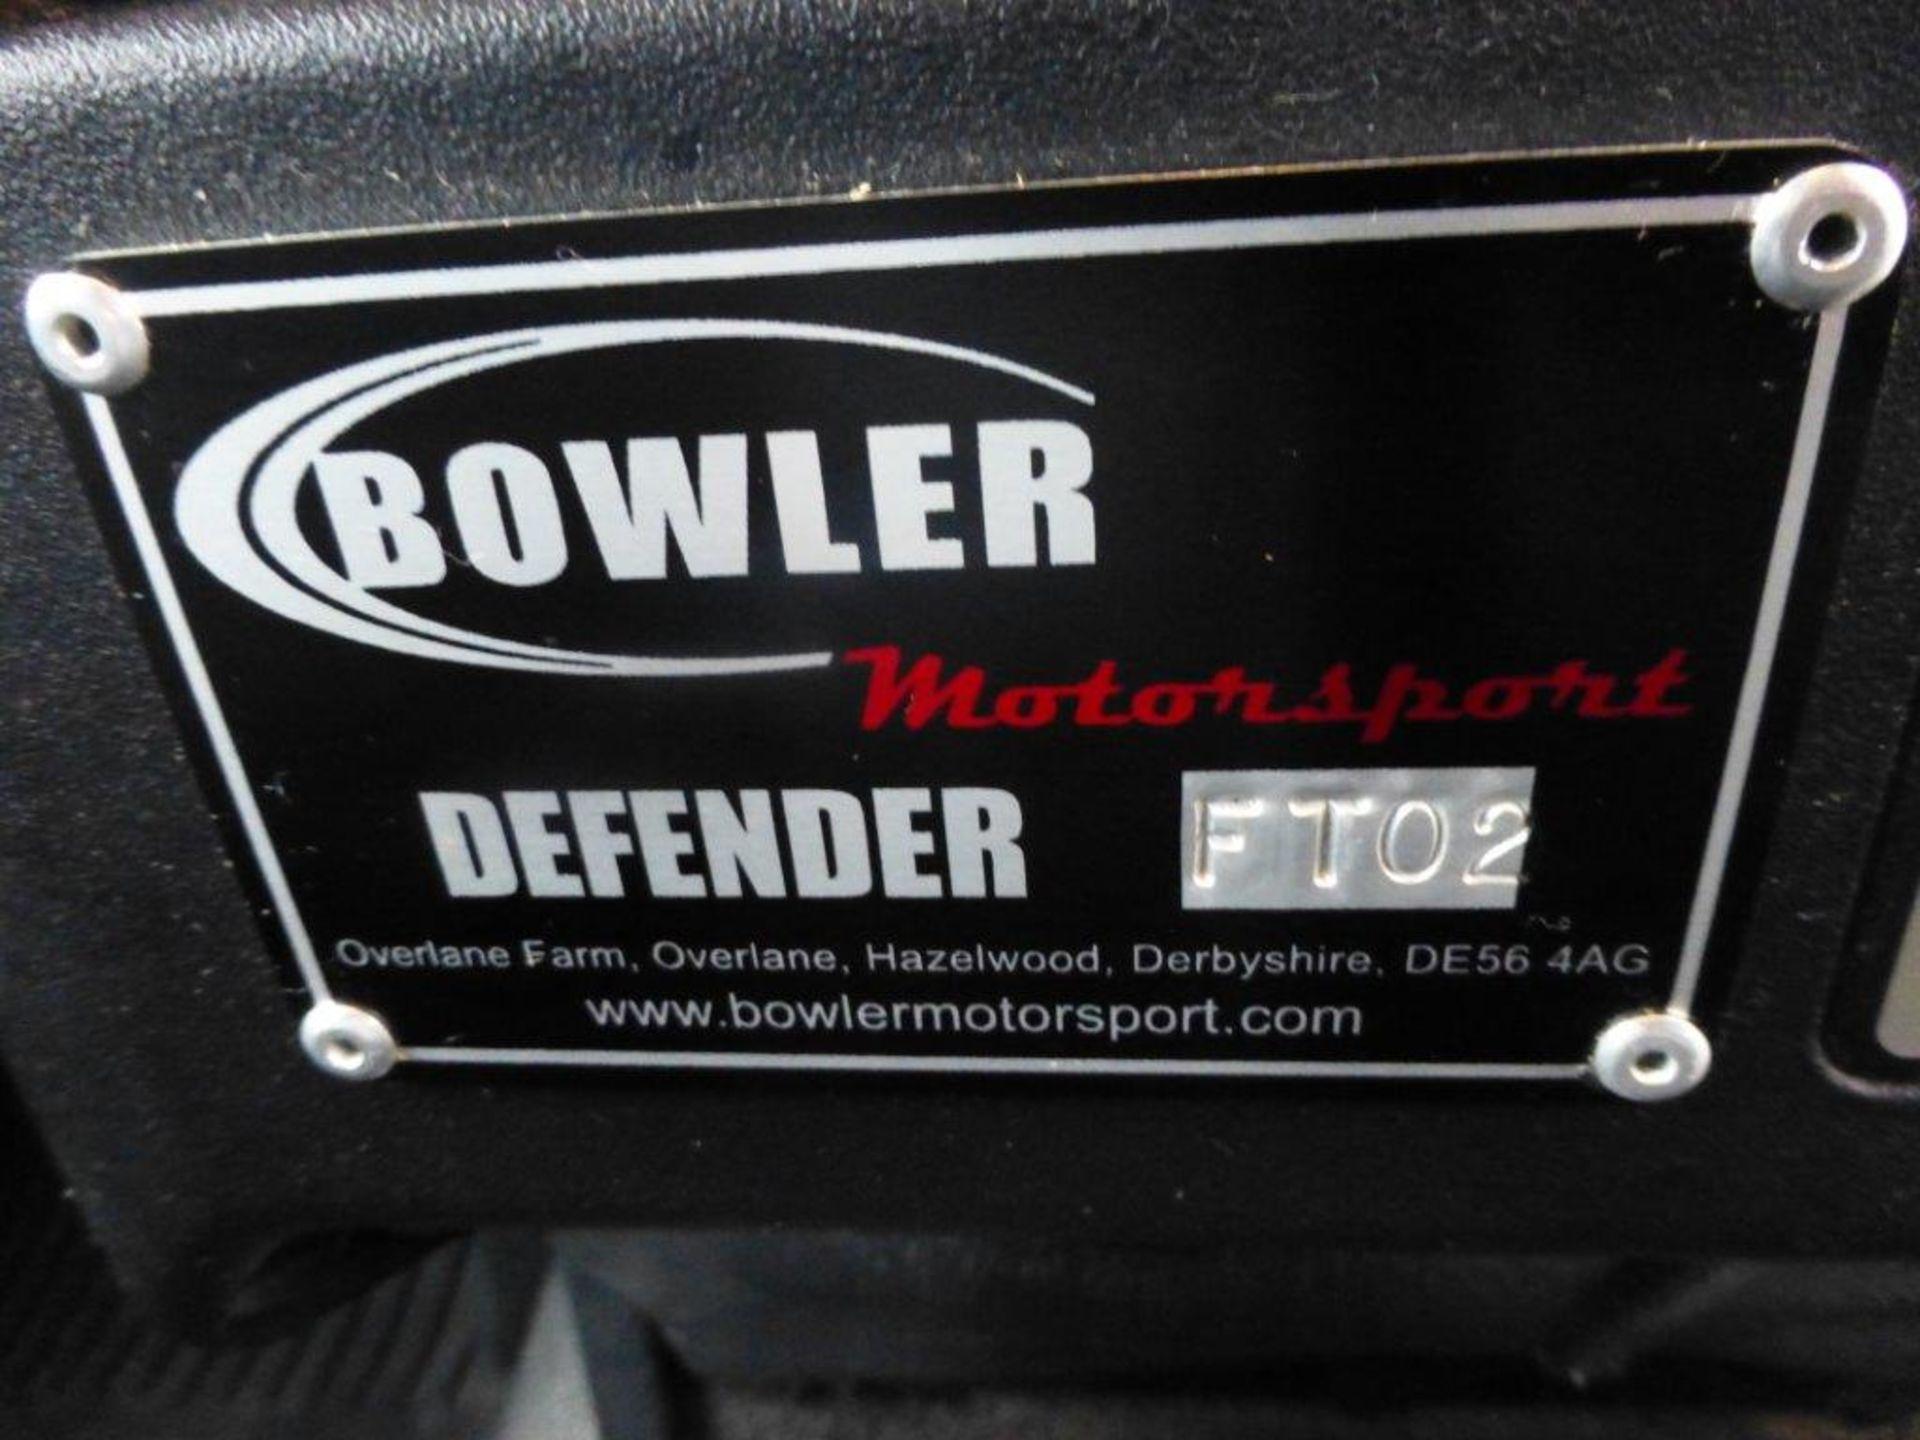 Land Rover Defender 110 XS Bowler double cab pickup TDCi (2.2). Reg no. FN15 LBK. Reg. date 23/03/ - Image 8 of 12